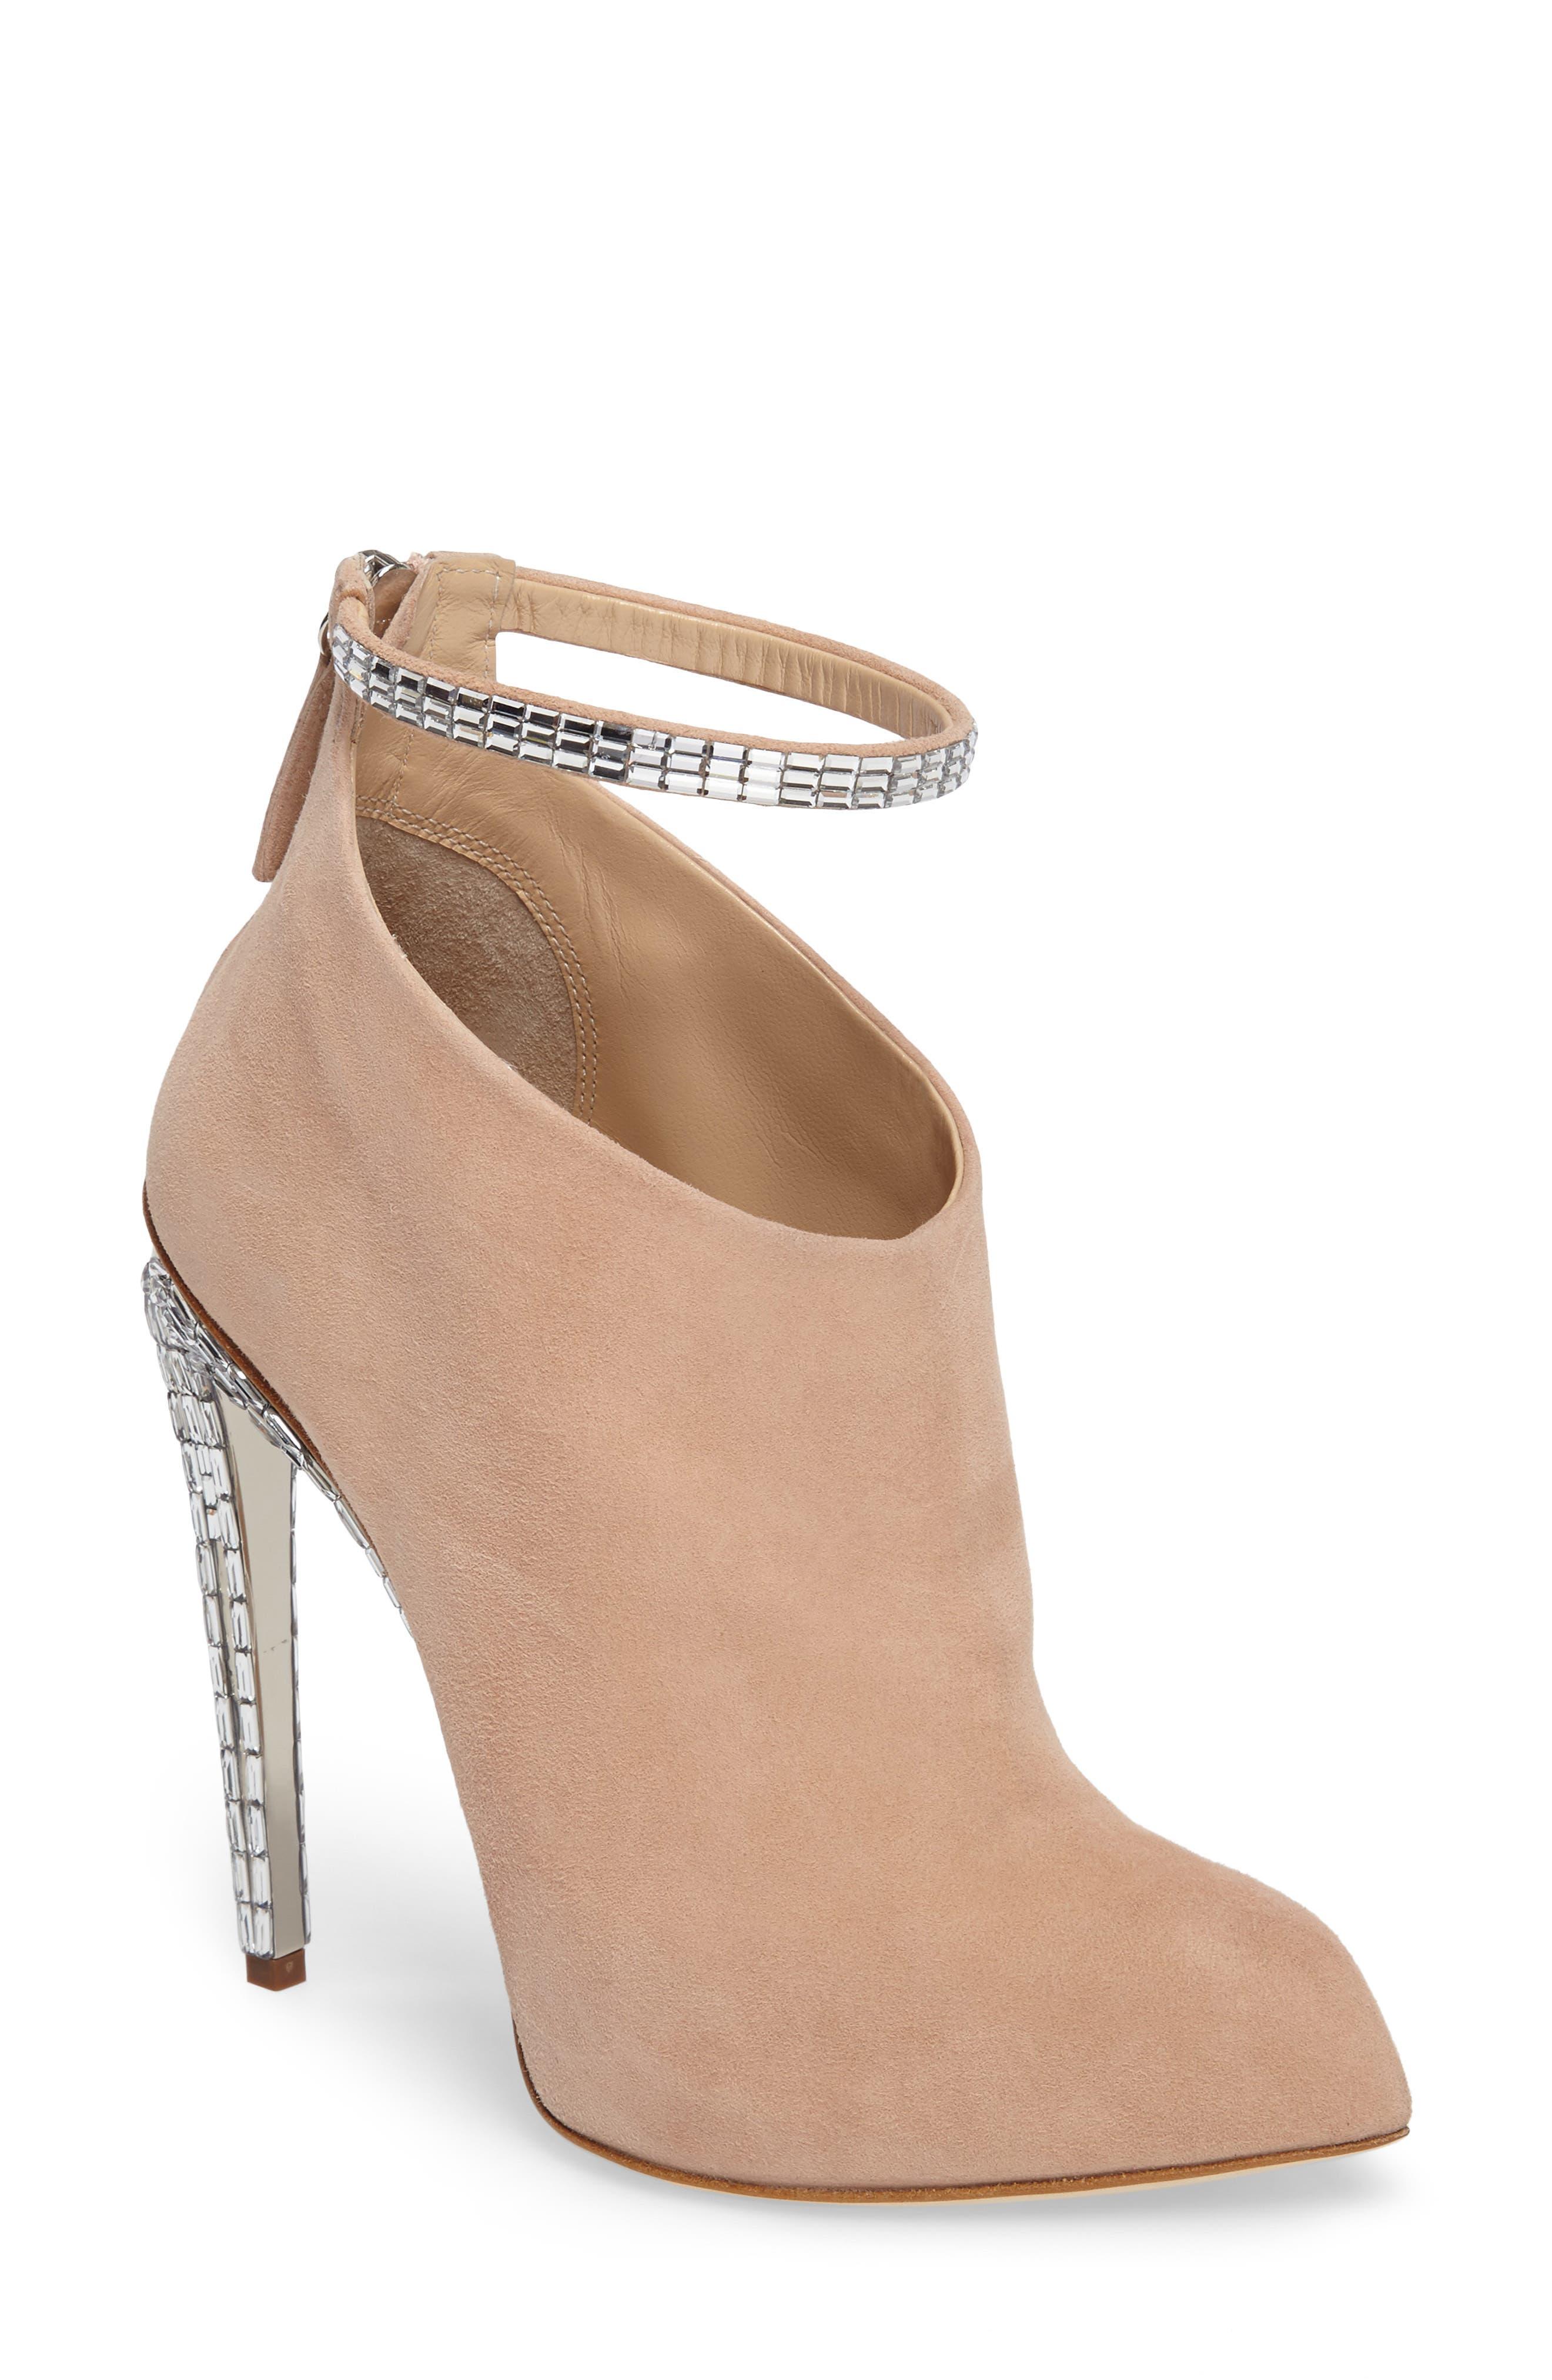 GIUSEPPE ZANOTTI Giuseppe for Jennifer Lopez Ankle Strap Bootie